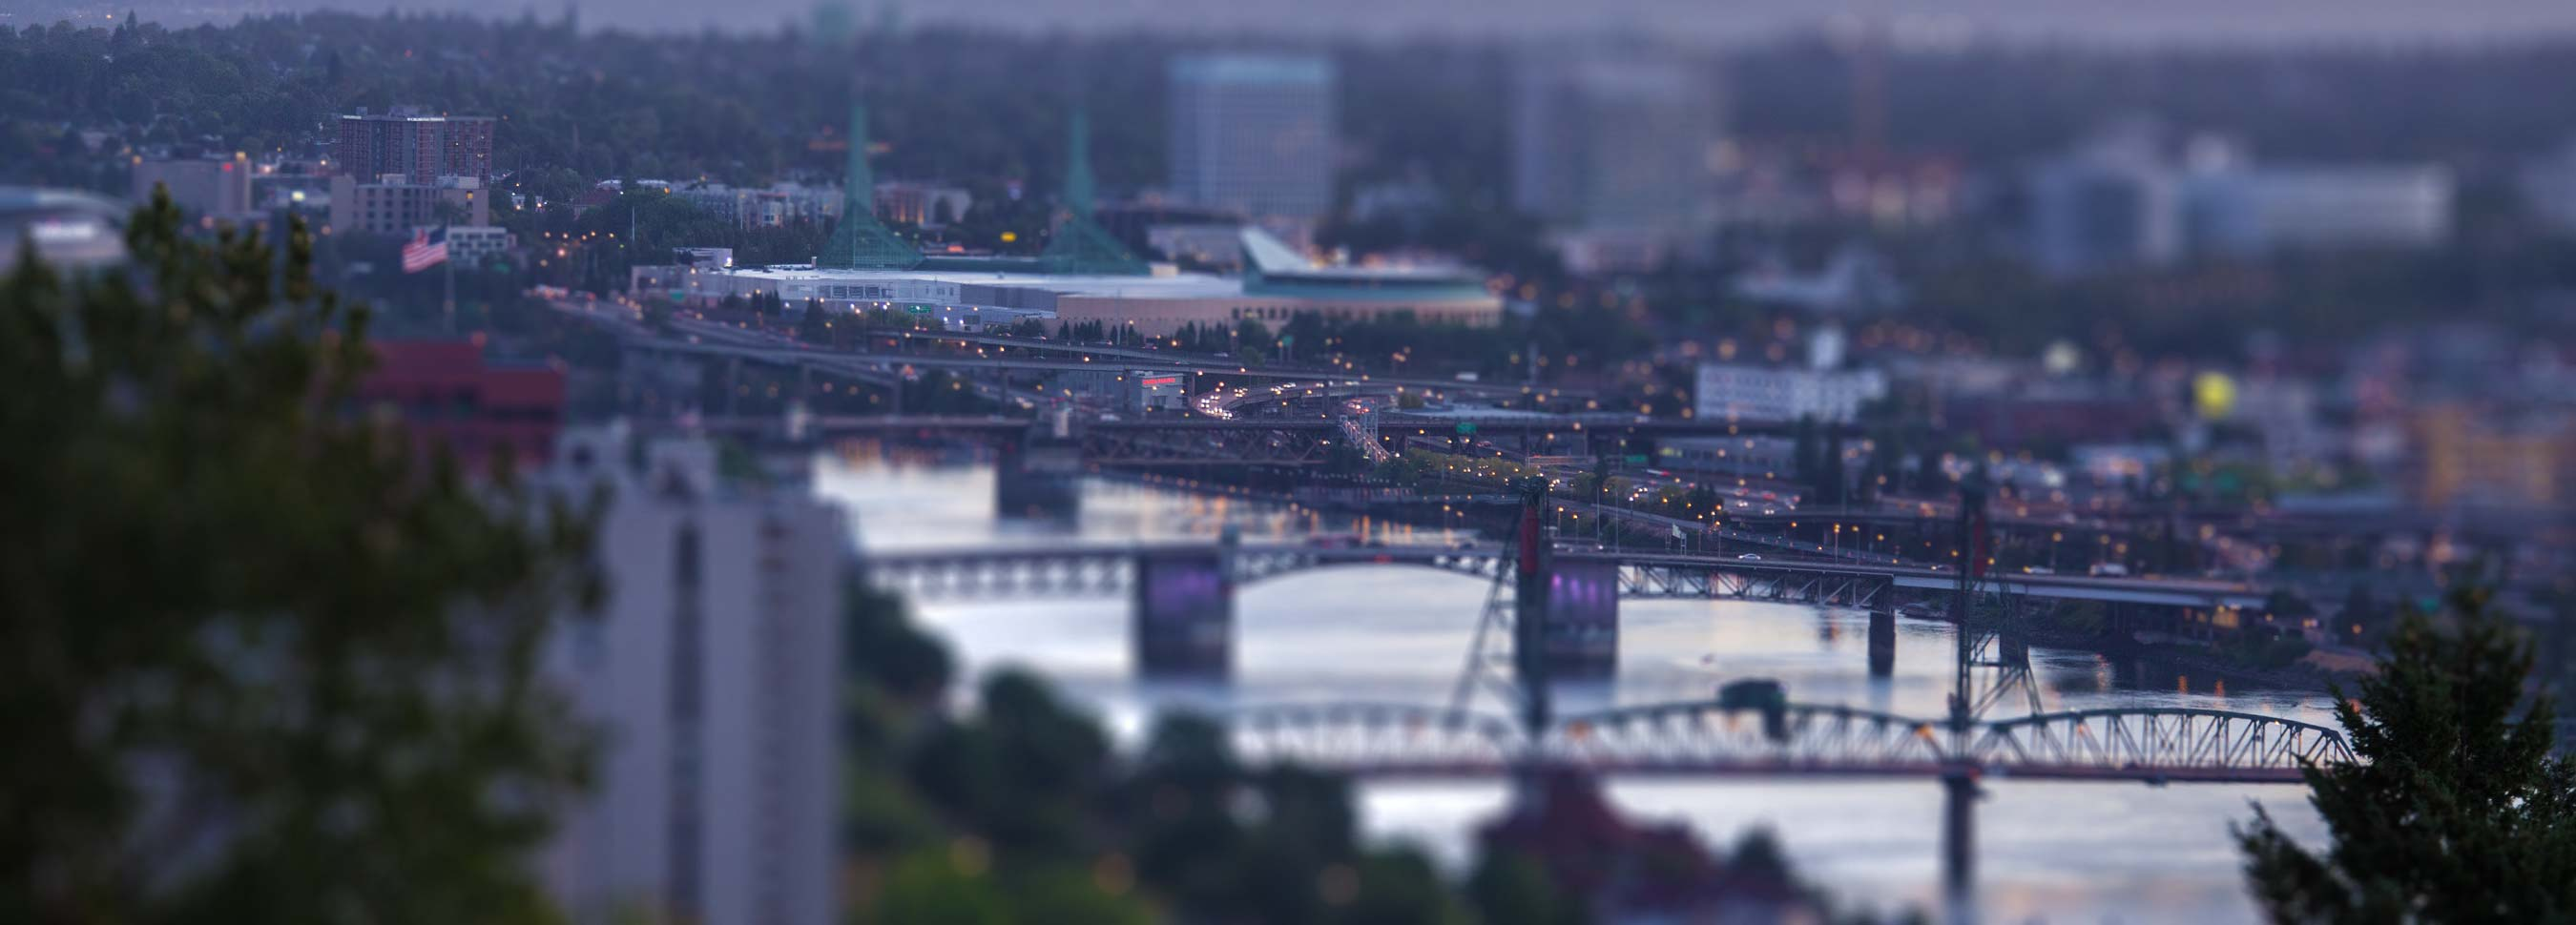 portland-skyline-bridges